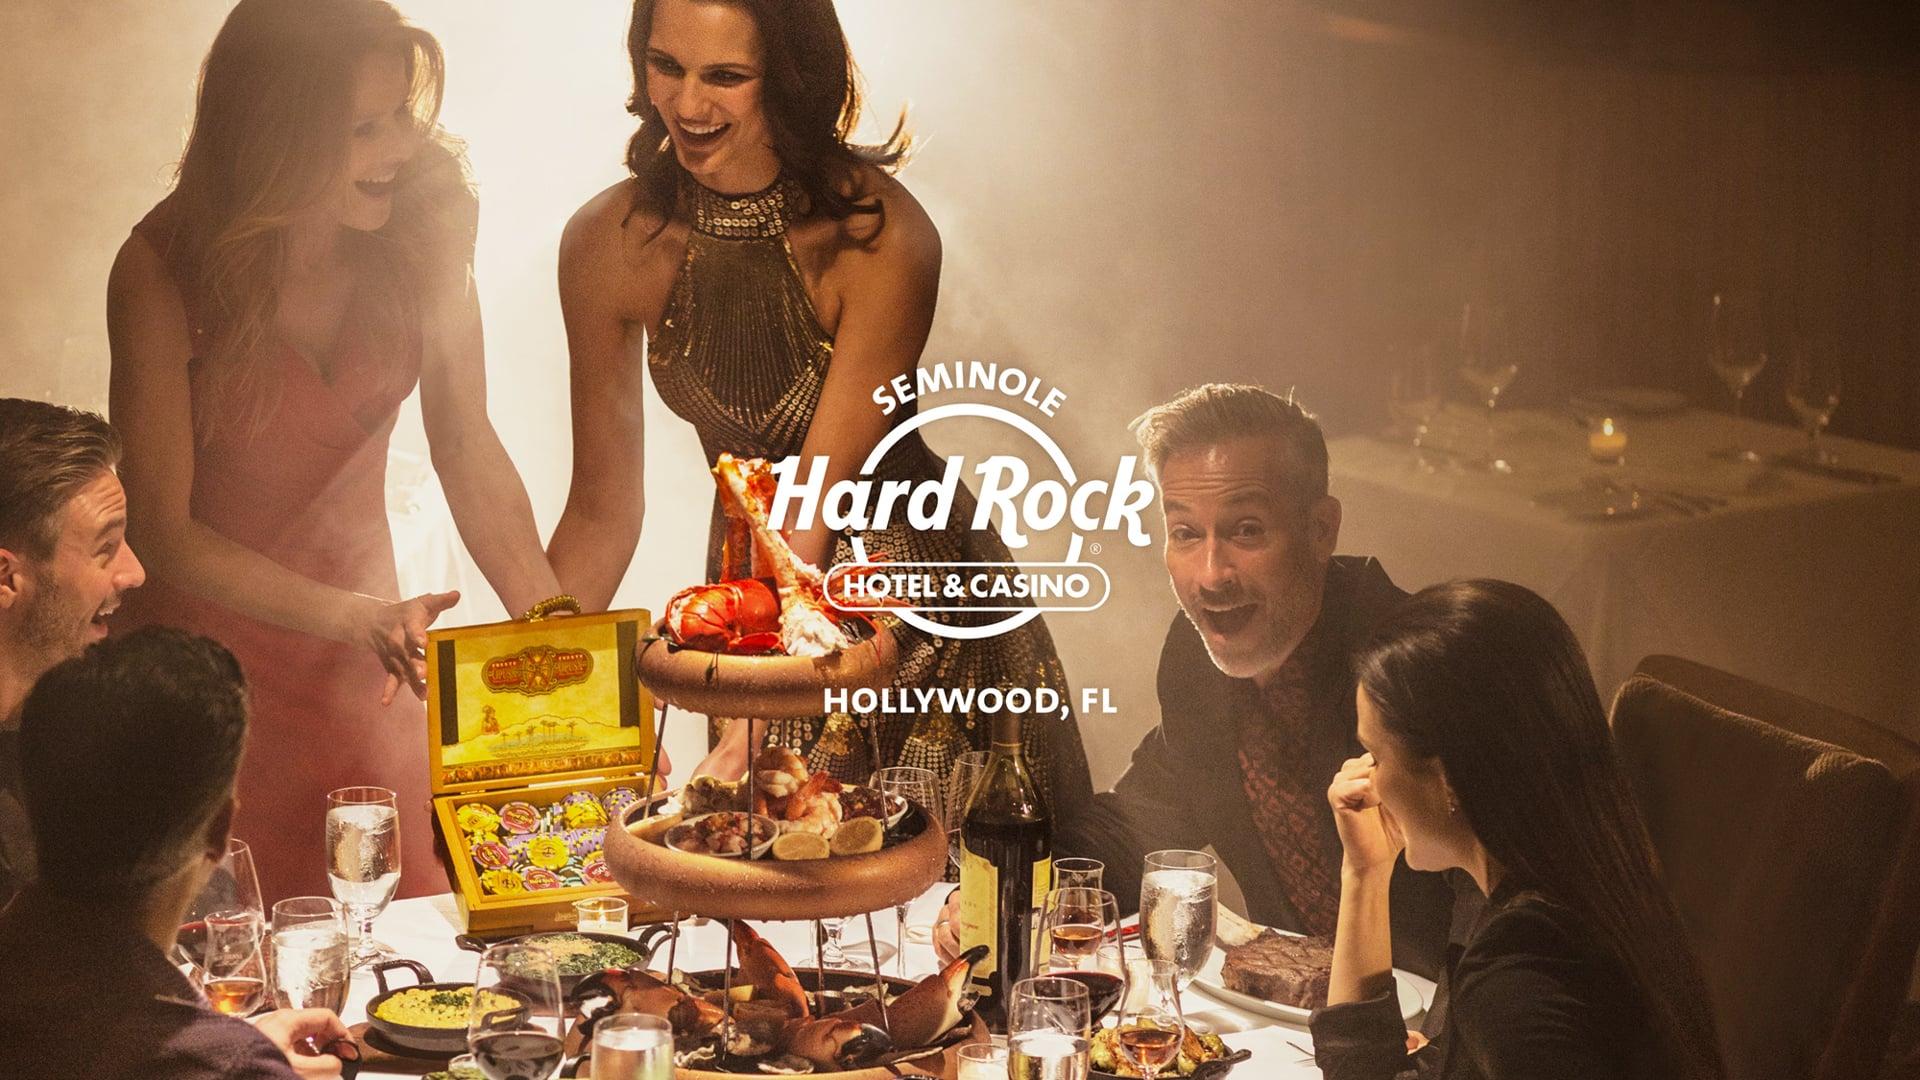 Hard Rock Hotel & Casino | A Rare Beauty